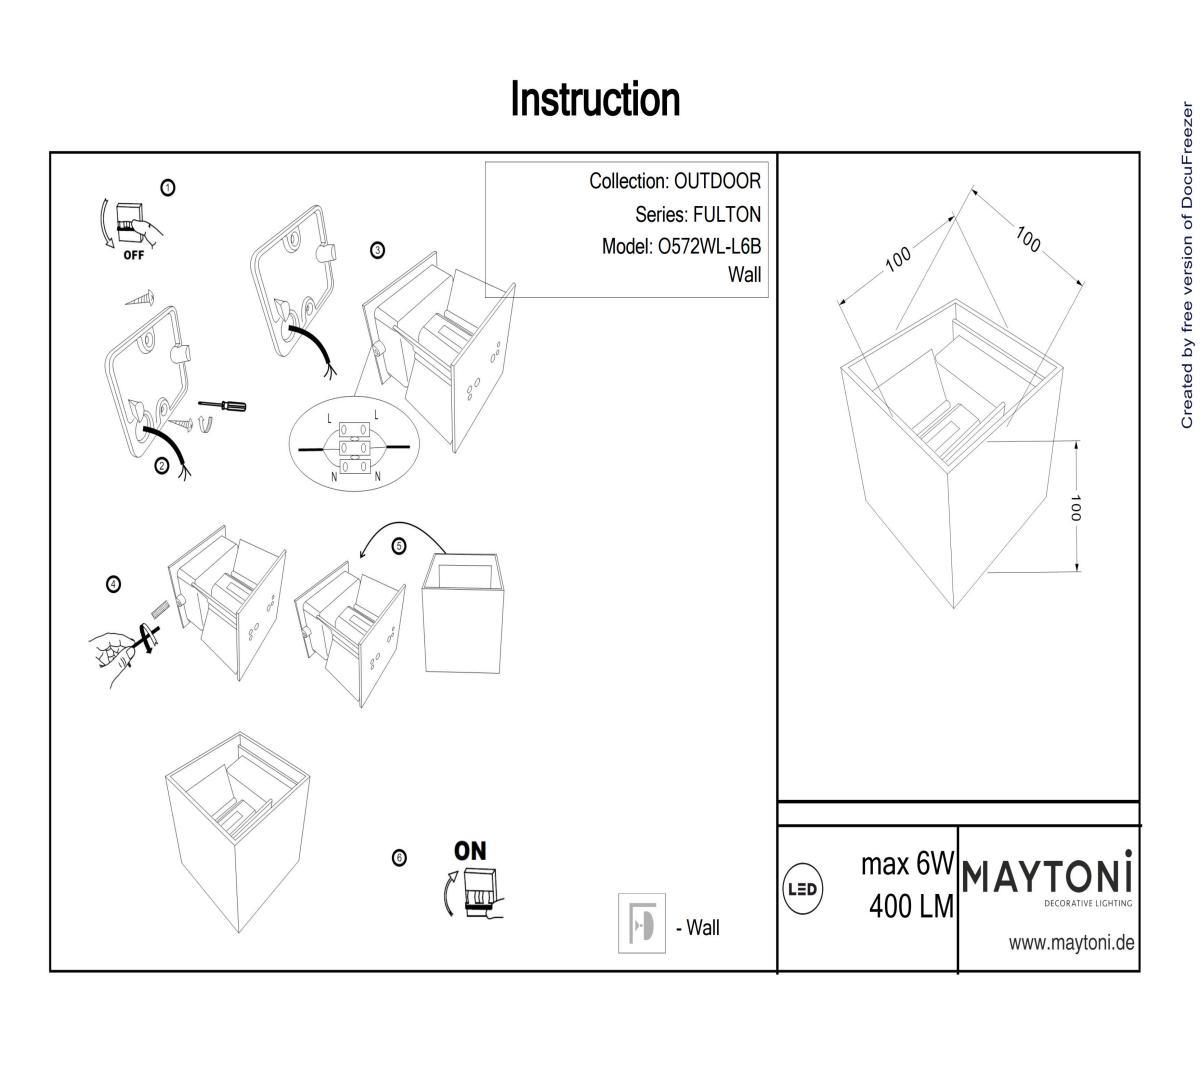 Бра настенное MAYTONI O572WL-L6B